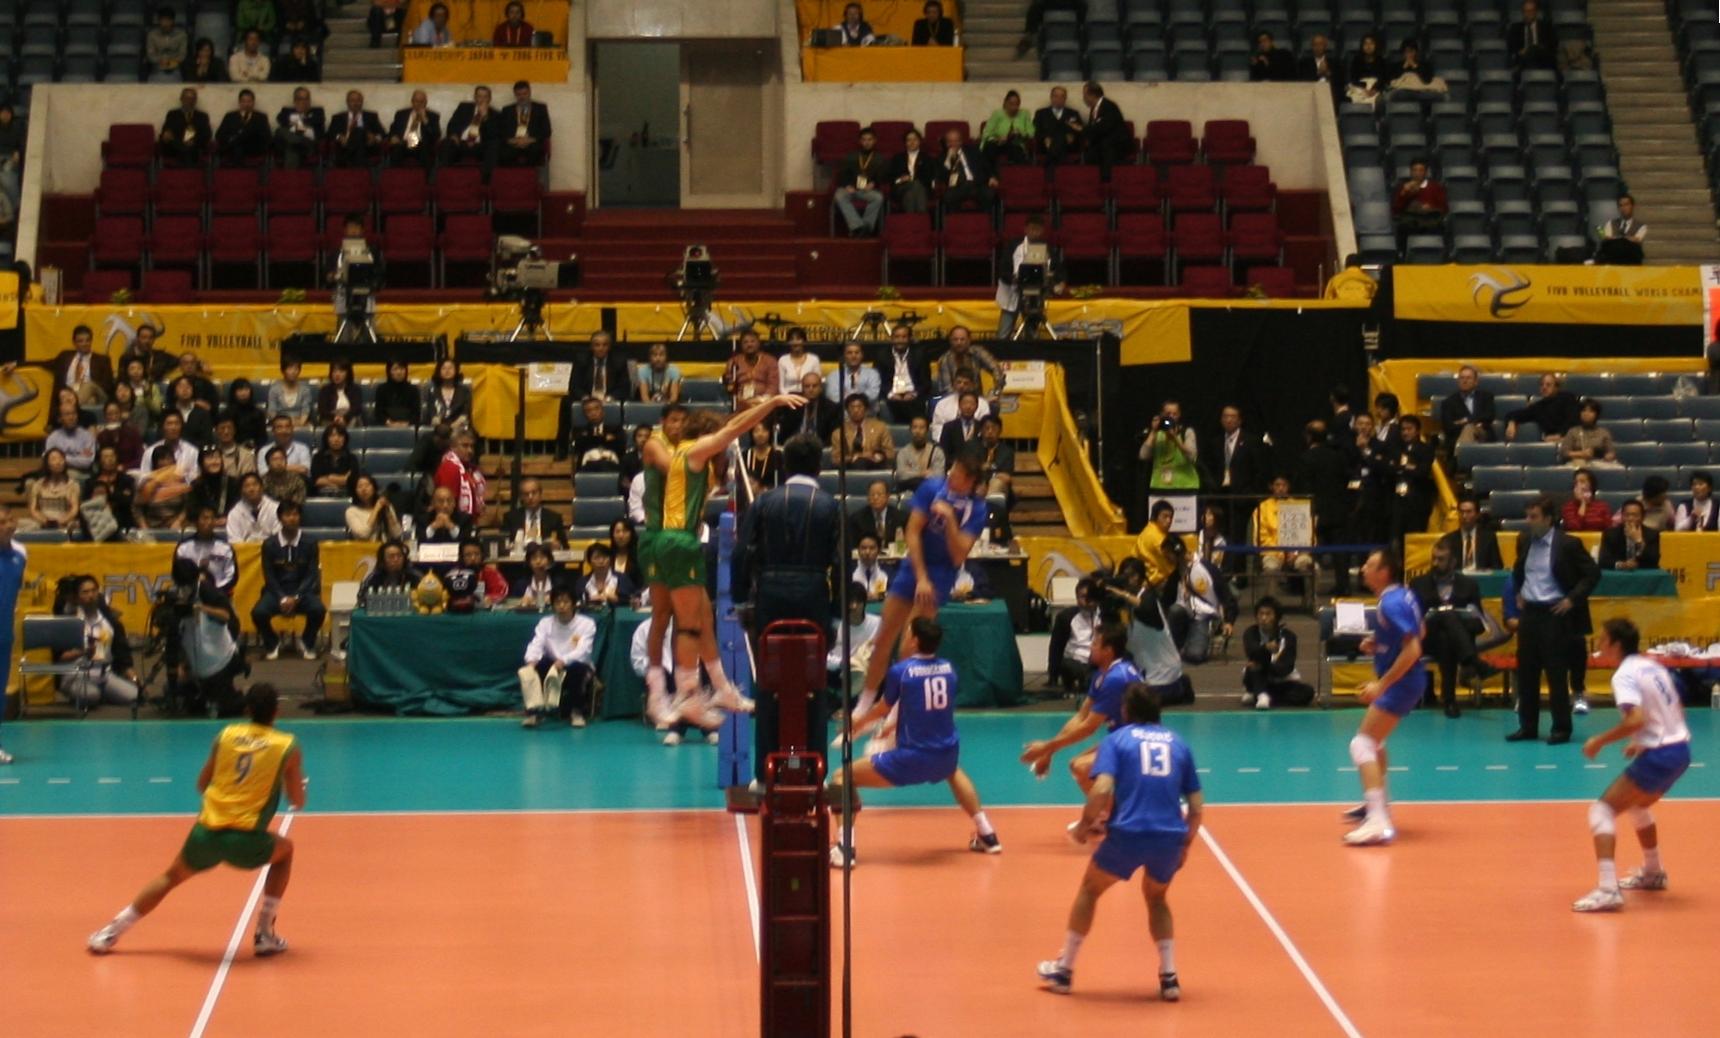 Sports Mens Volleyball WC 2006 Brazil Vs Serbia httpenwikipediaorgwikiBrazilmen27s